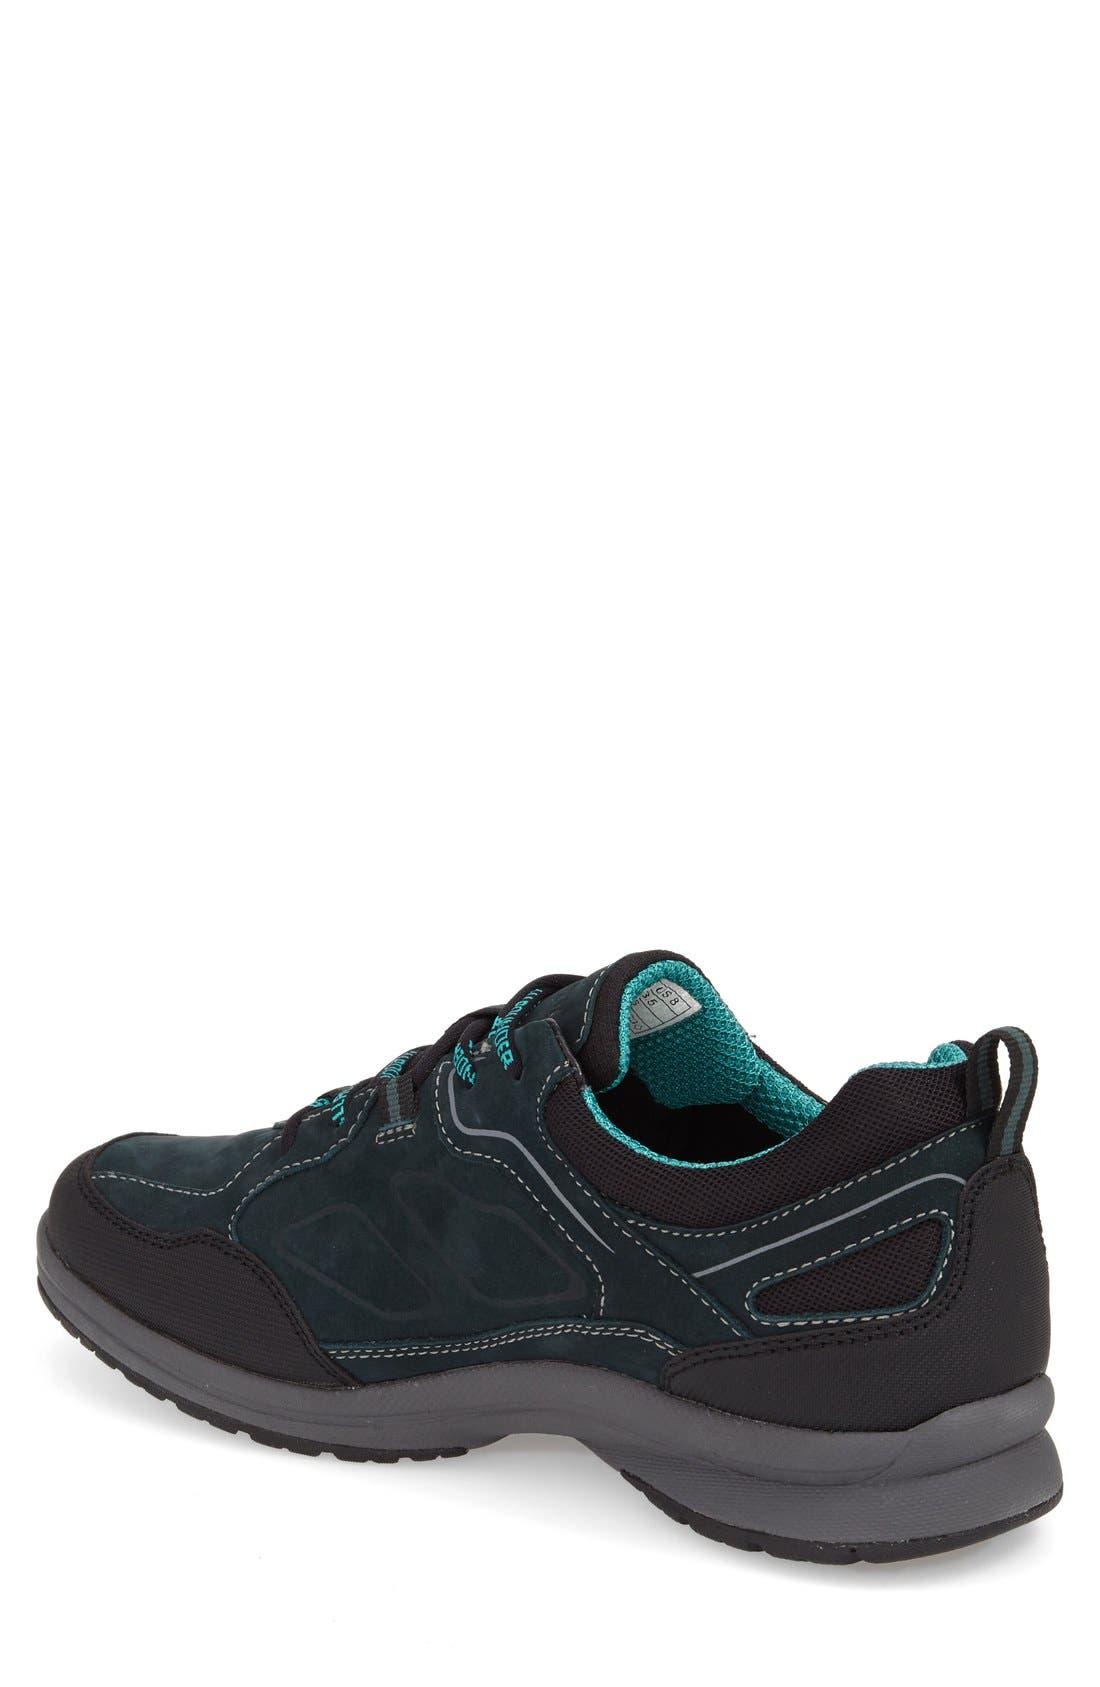 'Dascha Tex' Waterproof Sneaker,                             Alternate thumbnail 2, color,                             Black/ Olive Nubuck Leather